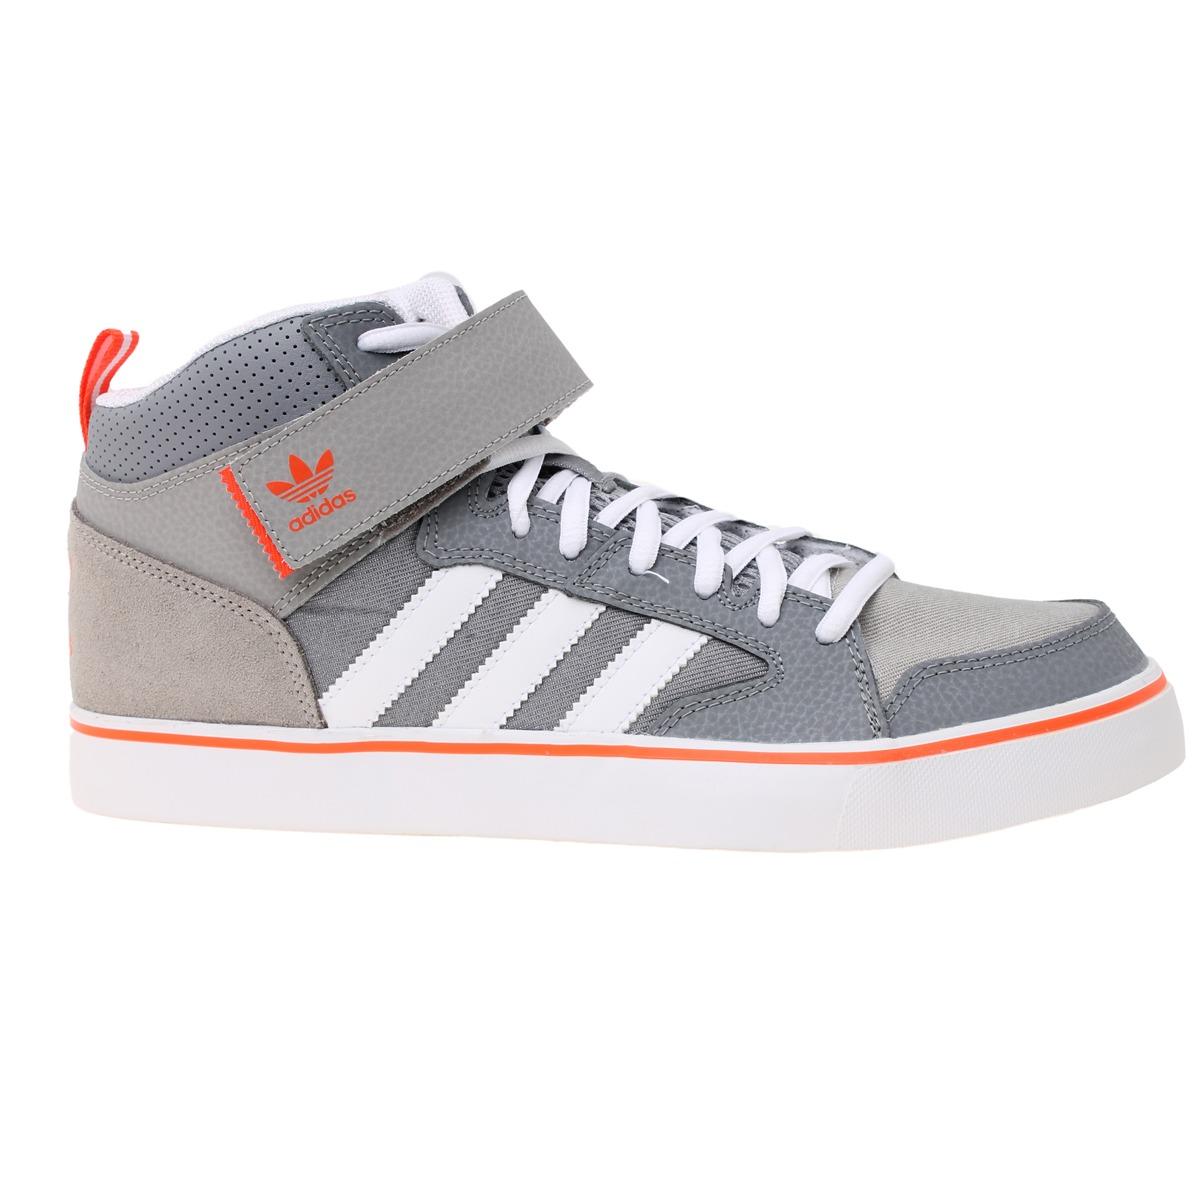 classic fit fe4bb abf22 botas adidas original varial ii mid sportline. Cargando zoom.